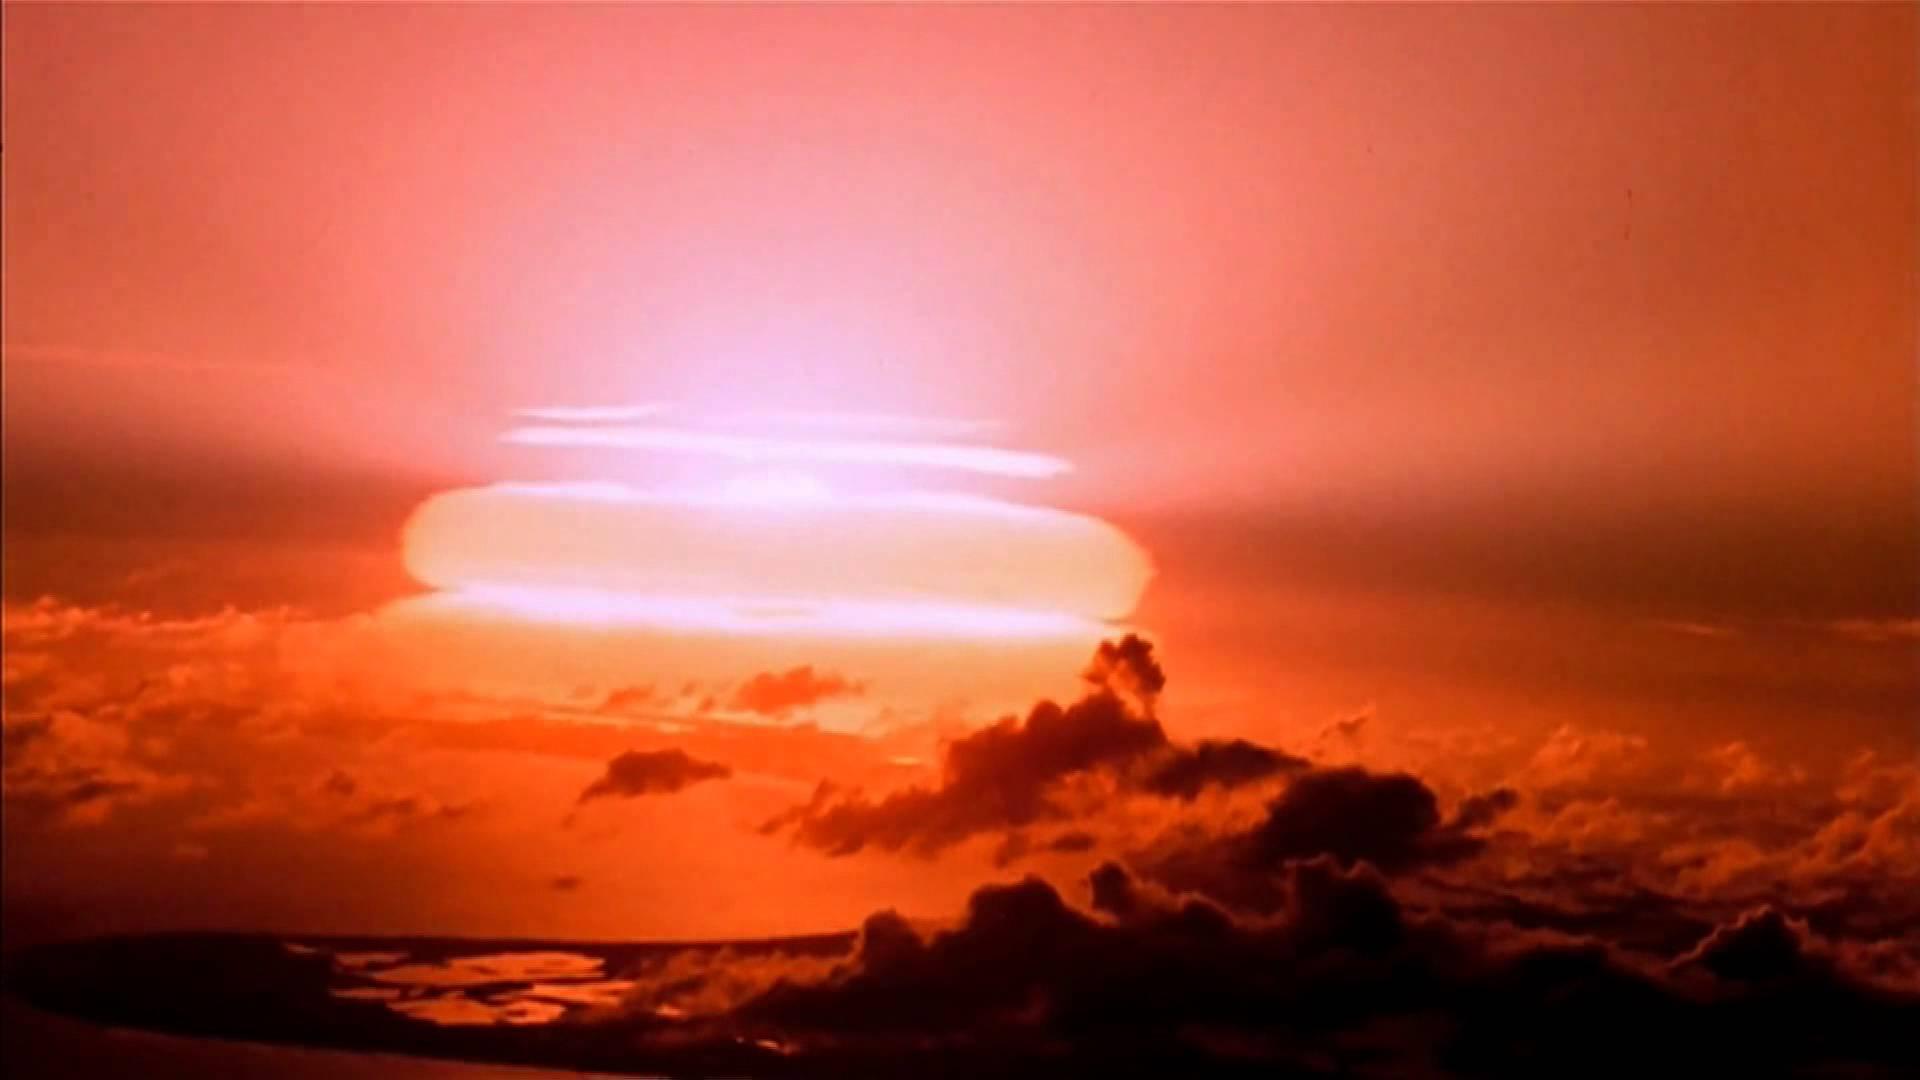 Corea del Nord: test nucleari a due minuti dall'apocalisse